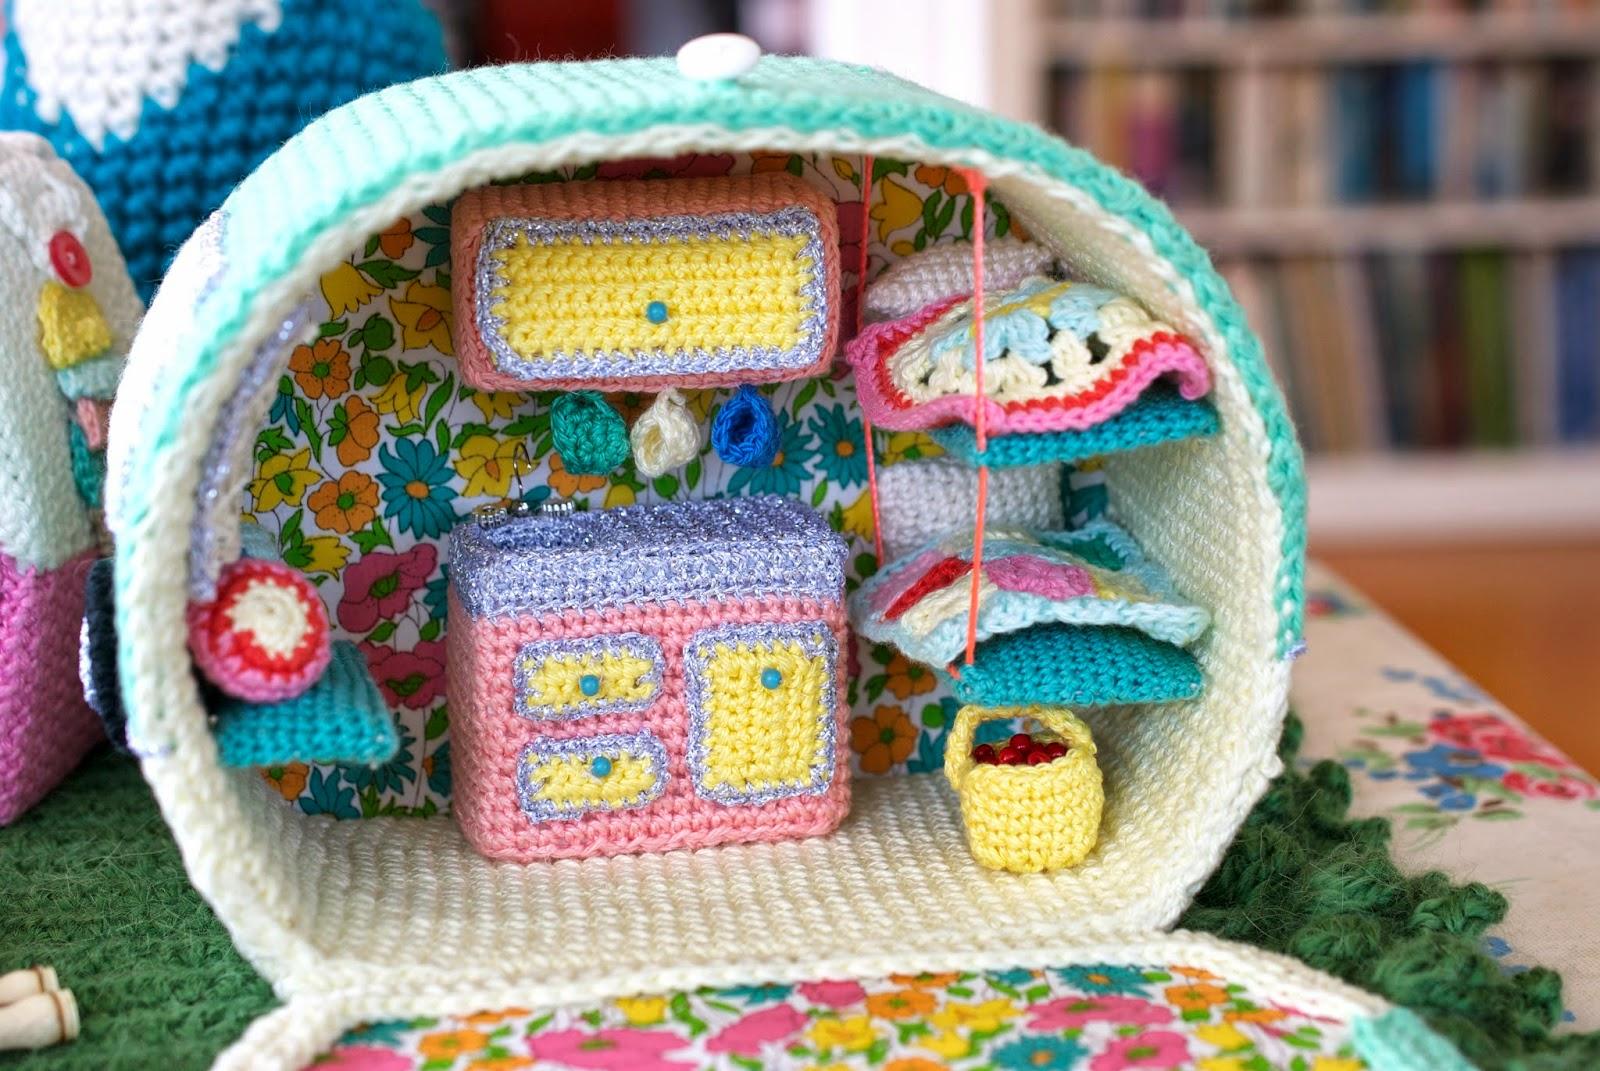 Caravan Knitting Pattern : Greedy For Colour: Crochet Caravan Pattern News!